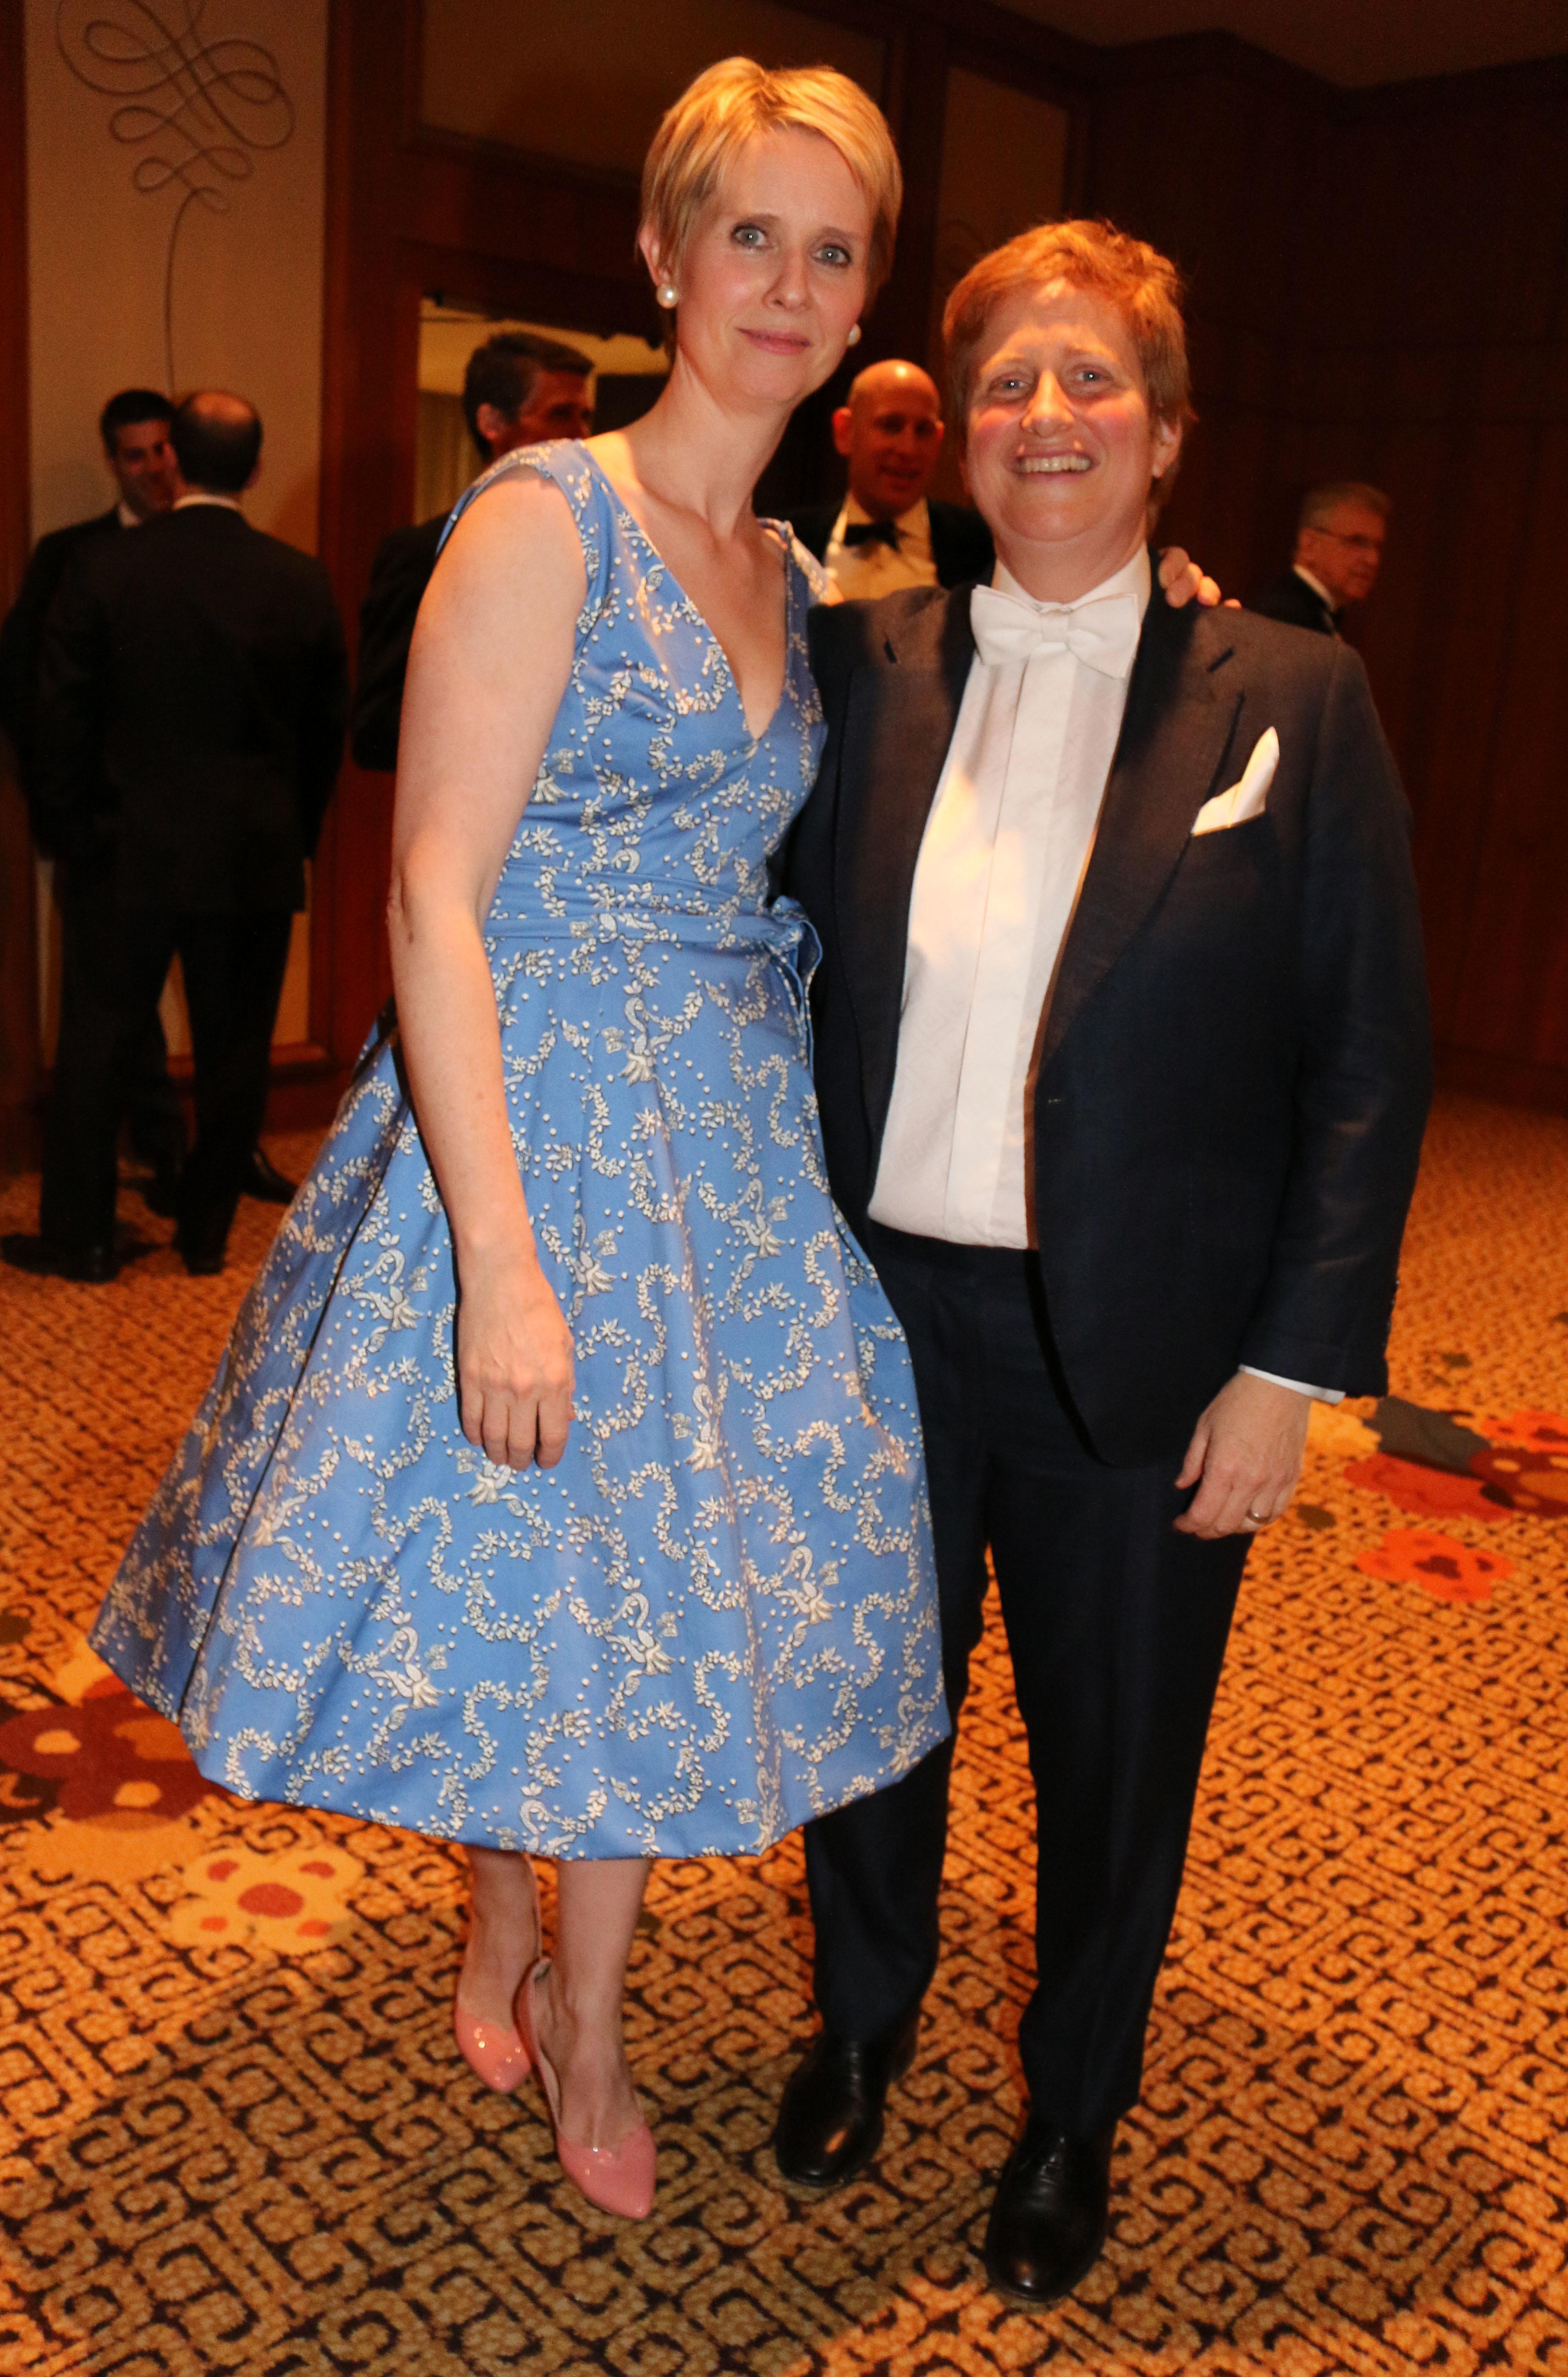 Cynthia Nixon Christina Marinoni Married Celebs Who